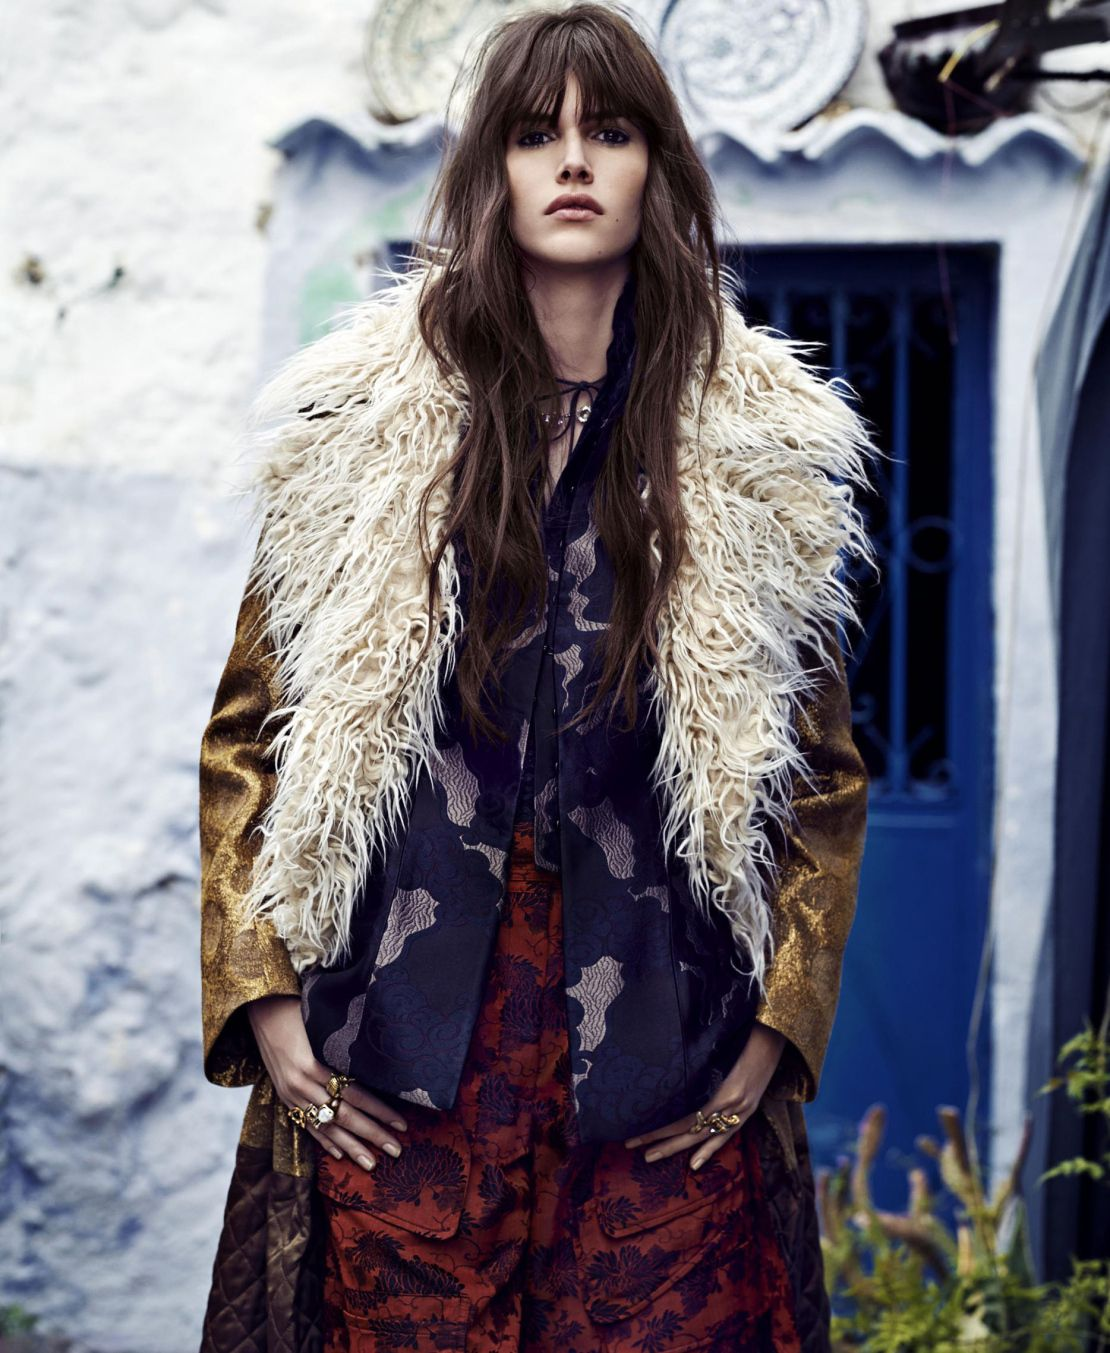 Vanessa Moody by Nathaniel Goldberg for Harper's Bazaar US August 2015 2